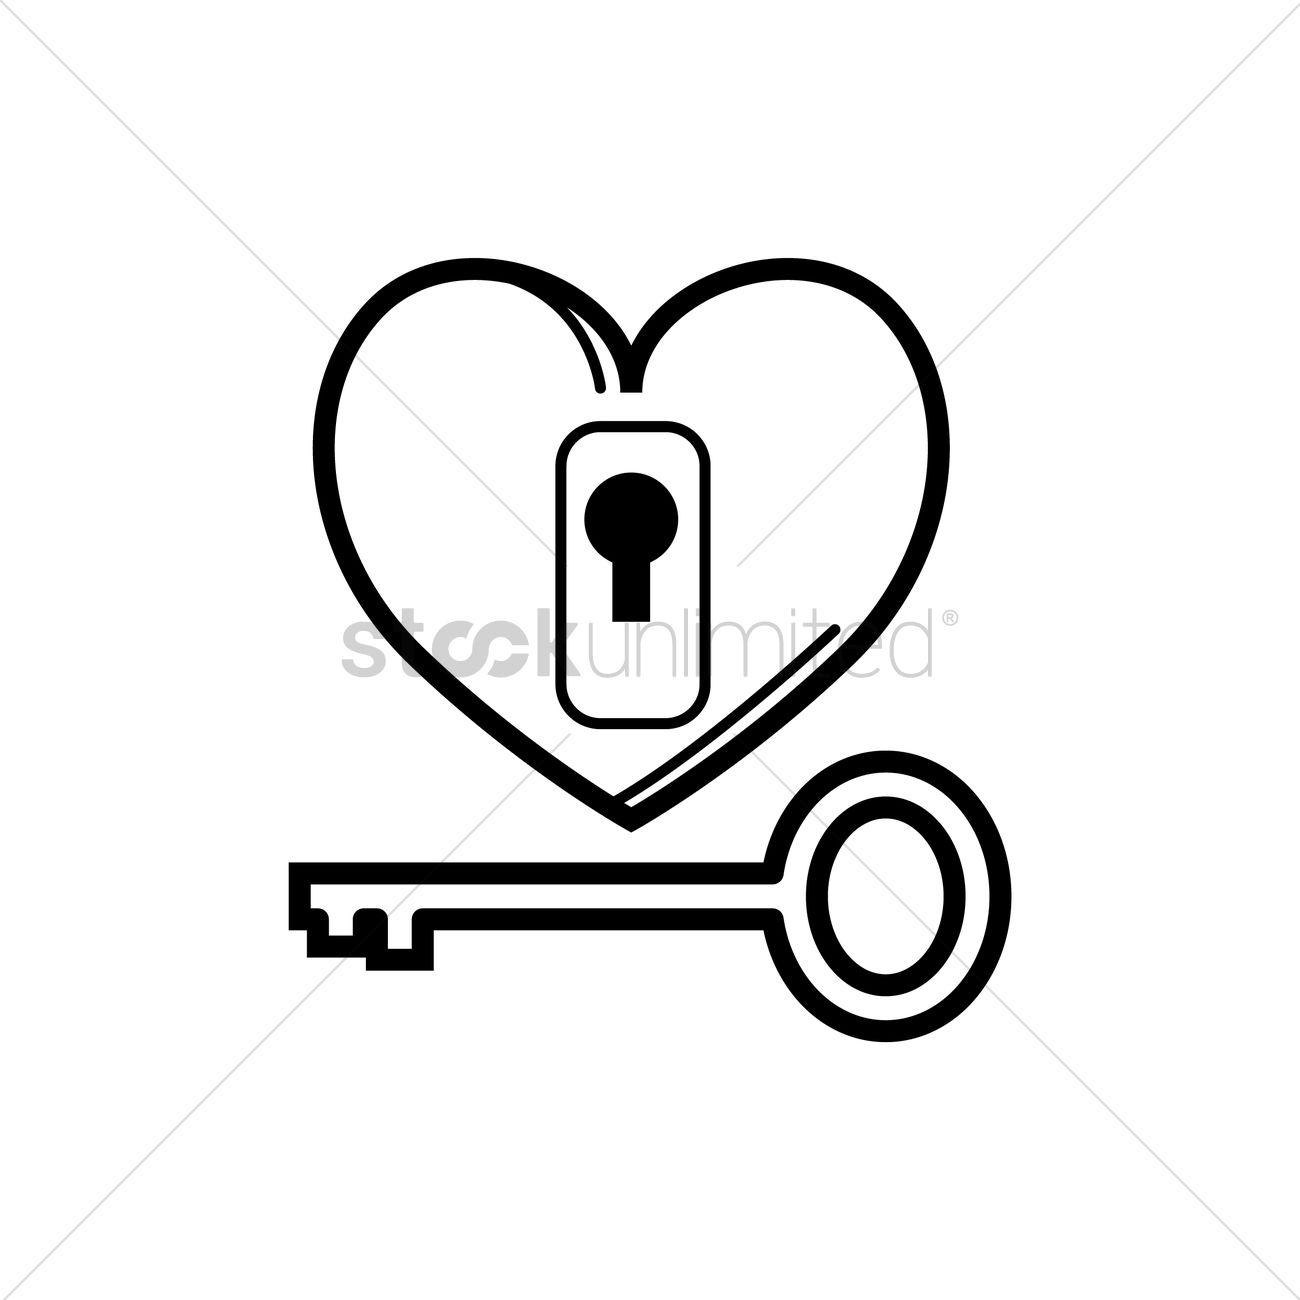 1300x1300 Love Lock And Key Vector Image